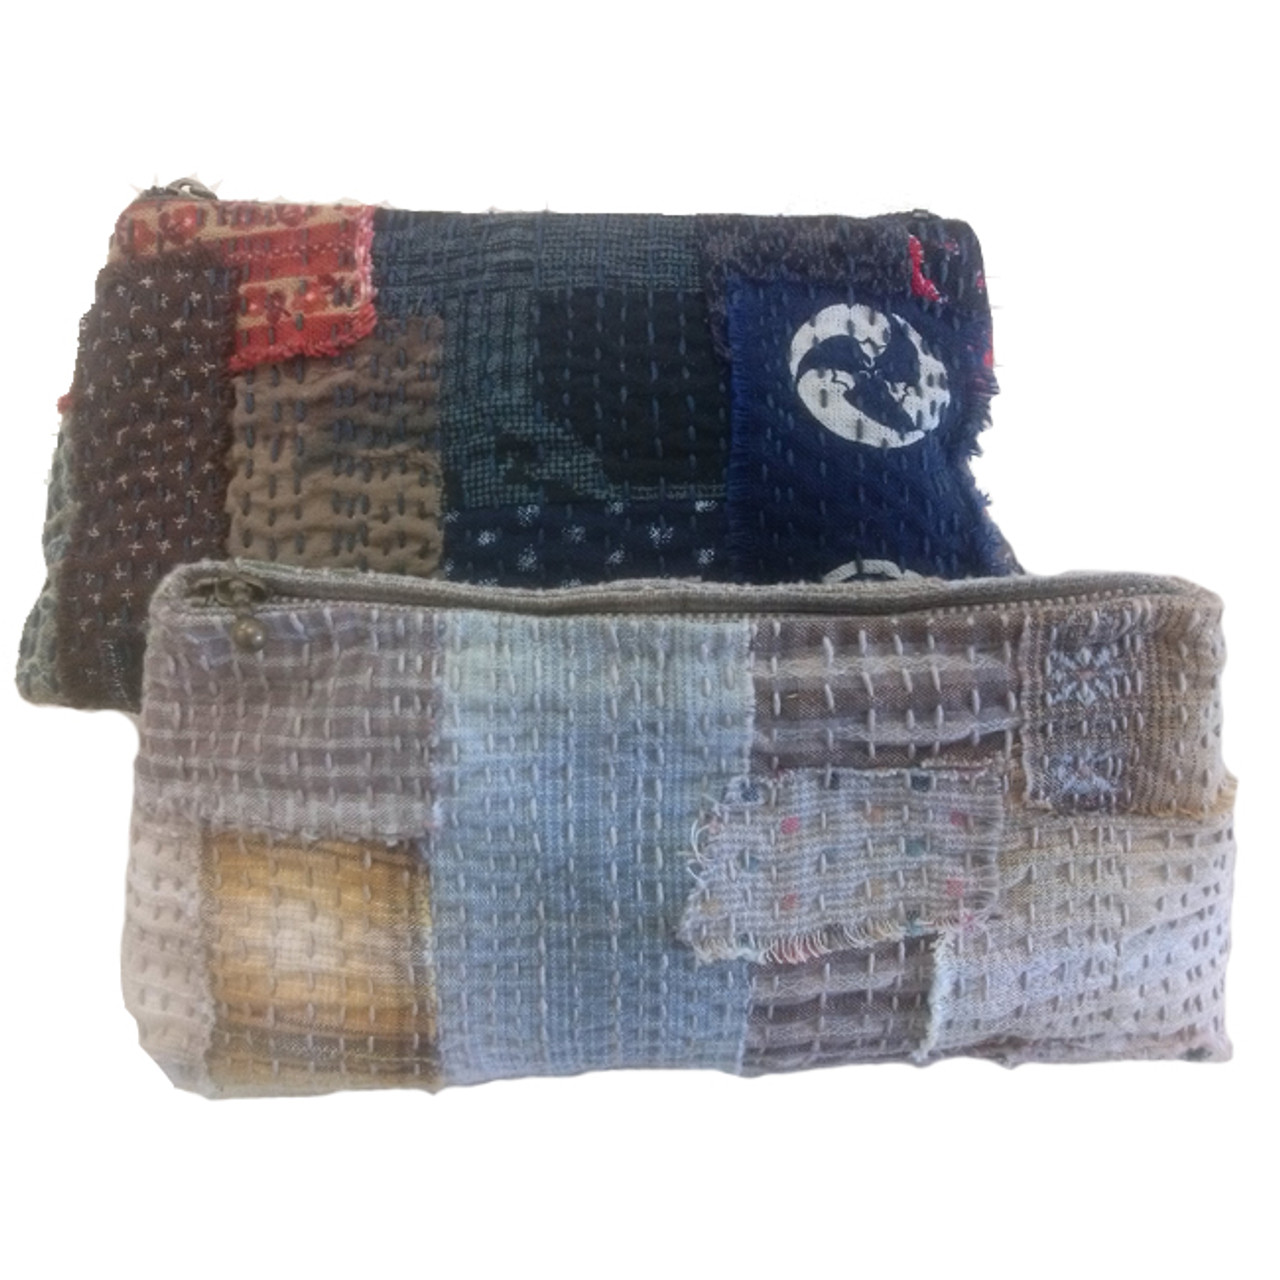 Zippi Purse Kit Bkz-1159 - Bebe Bold Japanese Textiles  Craft-5410